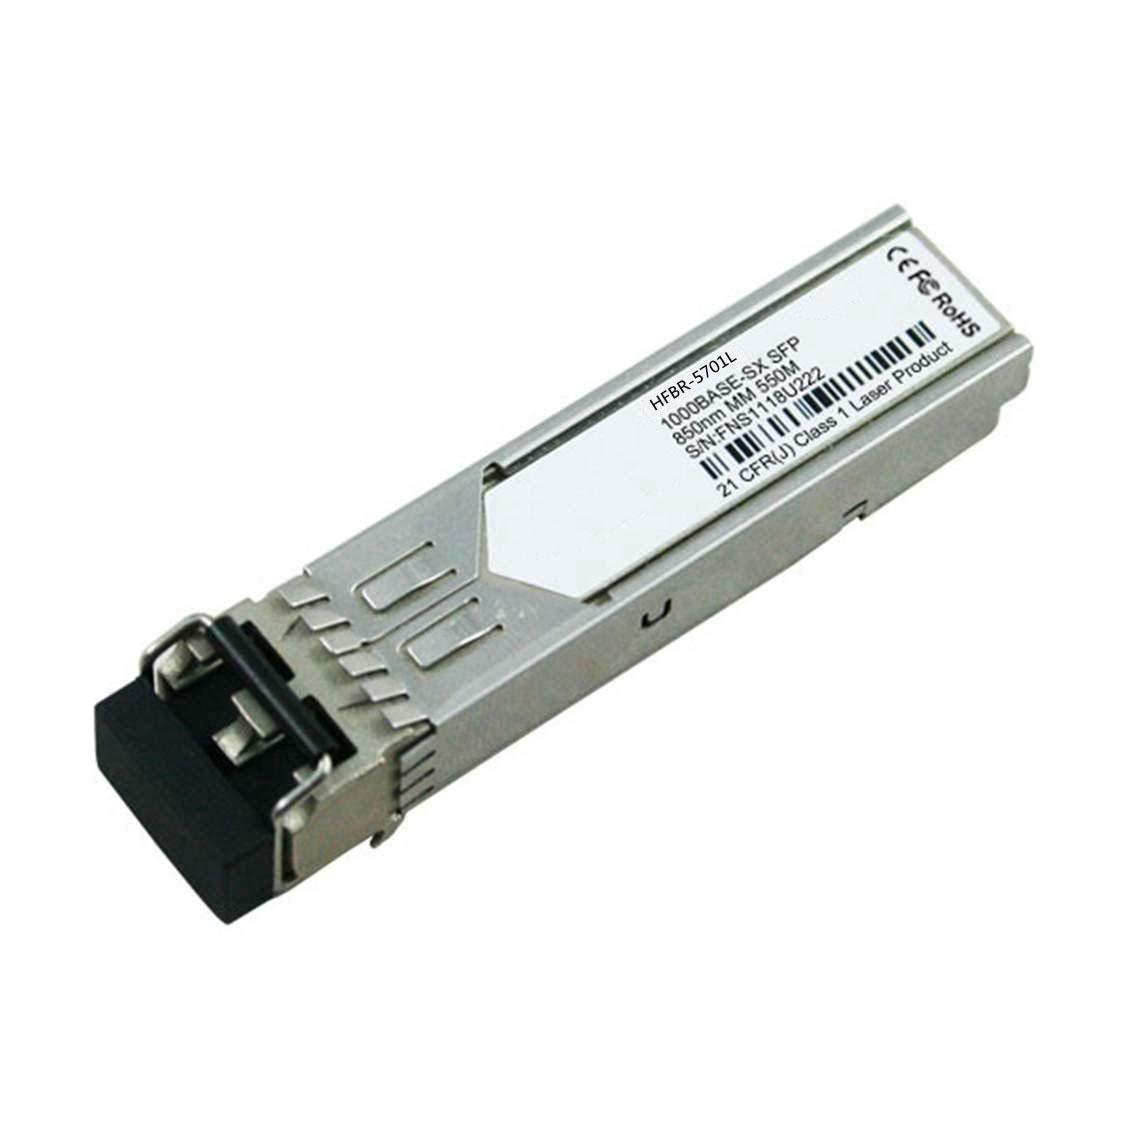 AXIOM E1MG-LX-AX 1000Base-LX LX SFP SMF mini-GBIC Gigabit Ethernet Transceiver